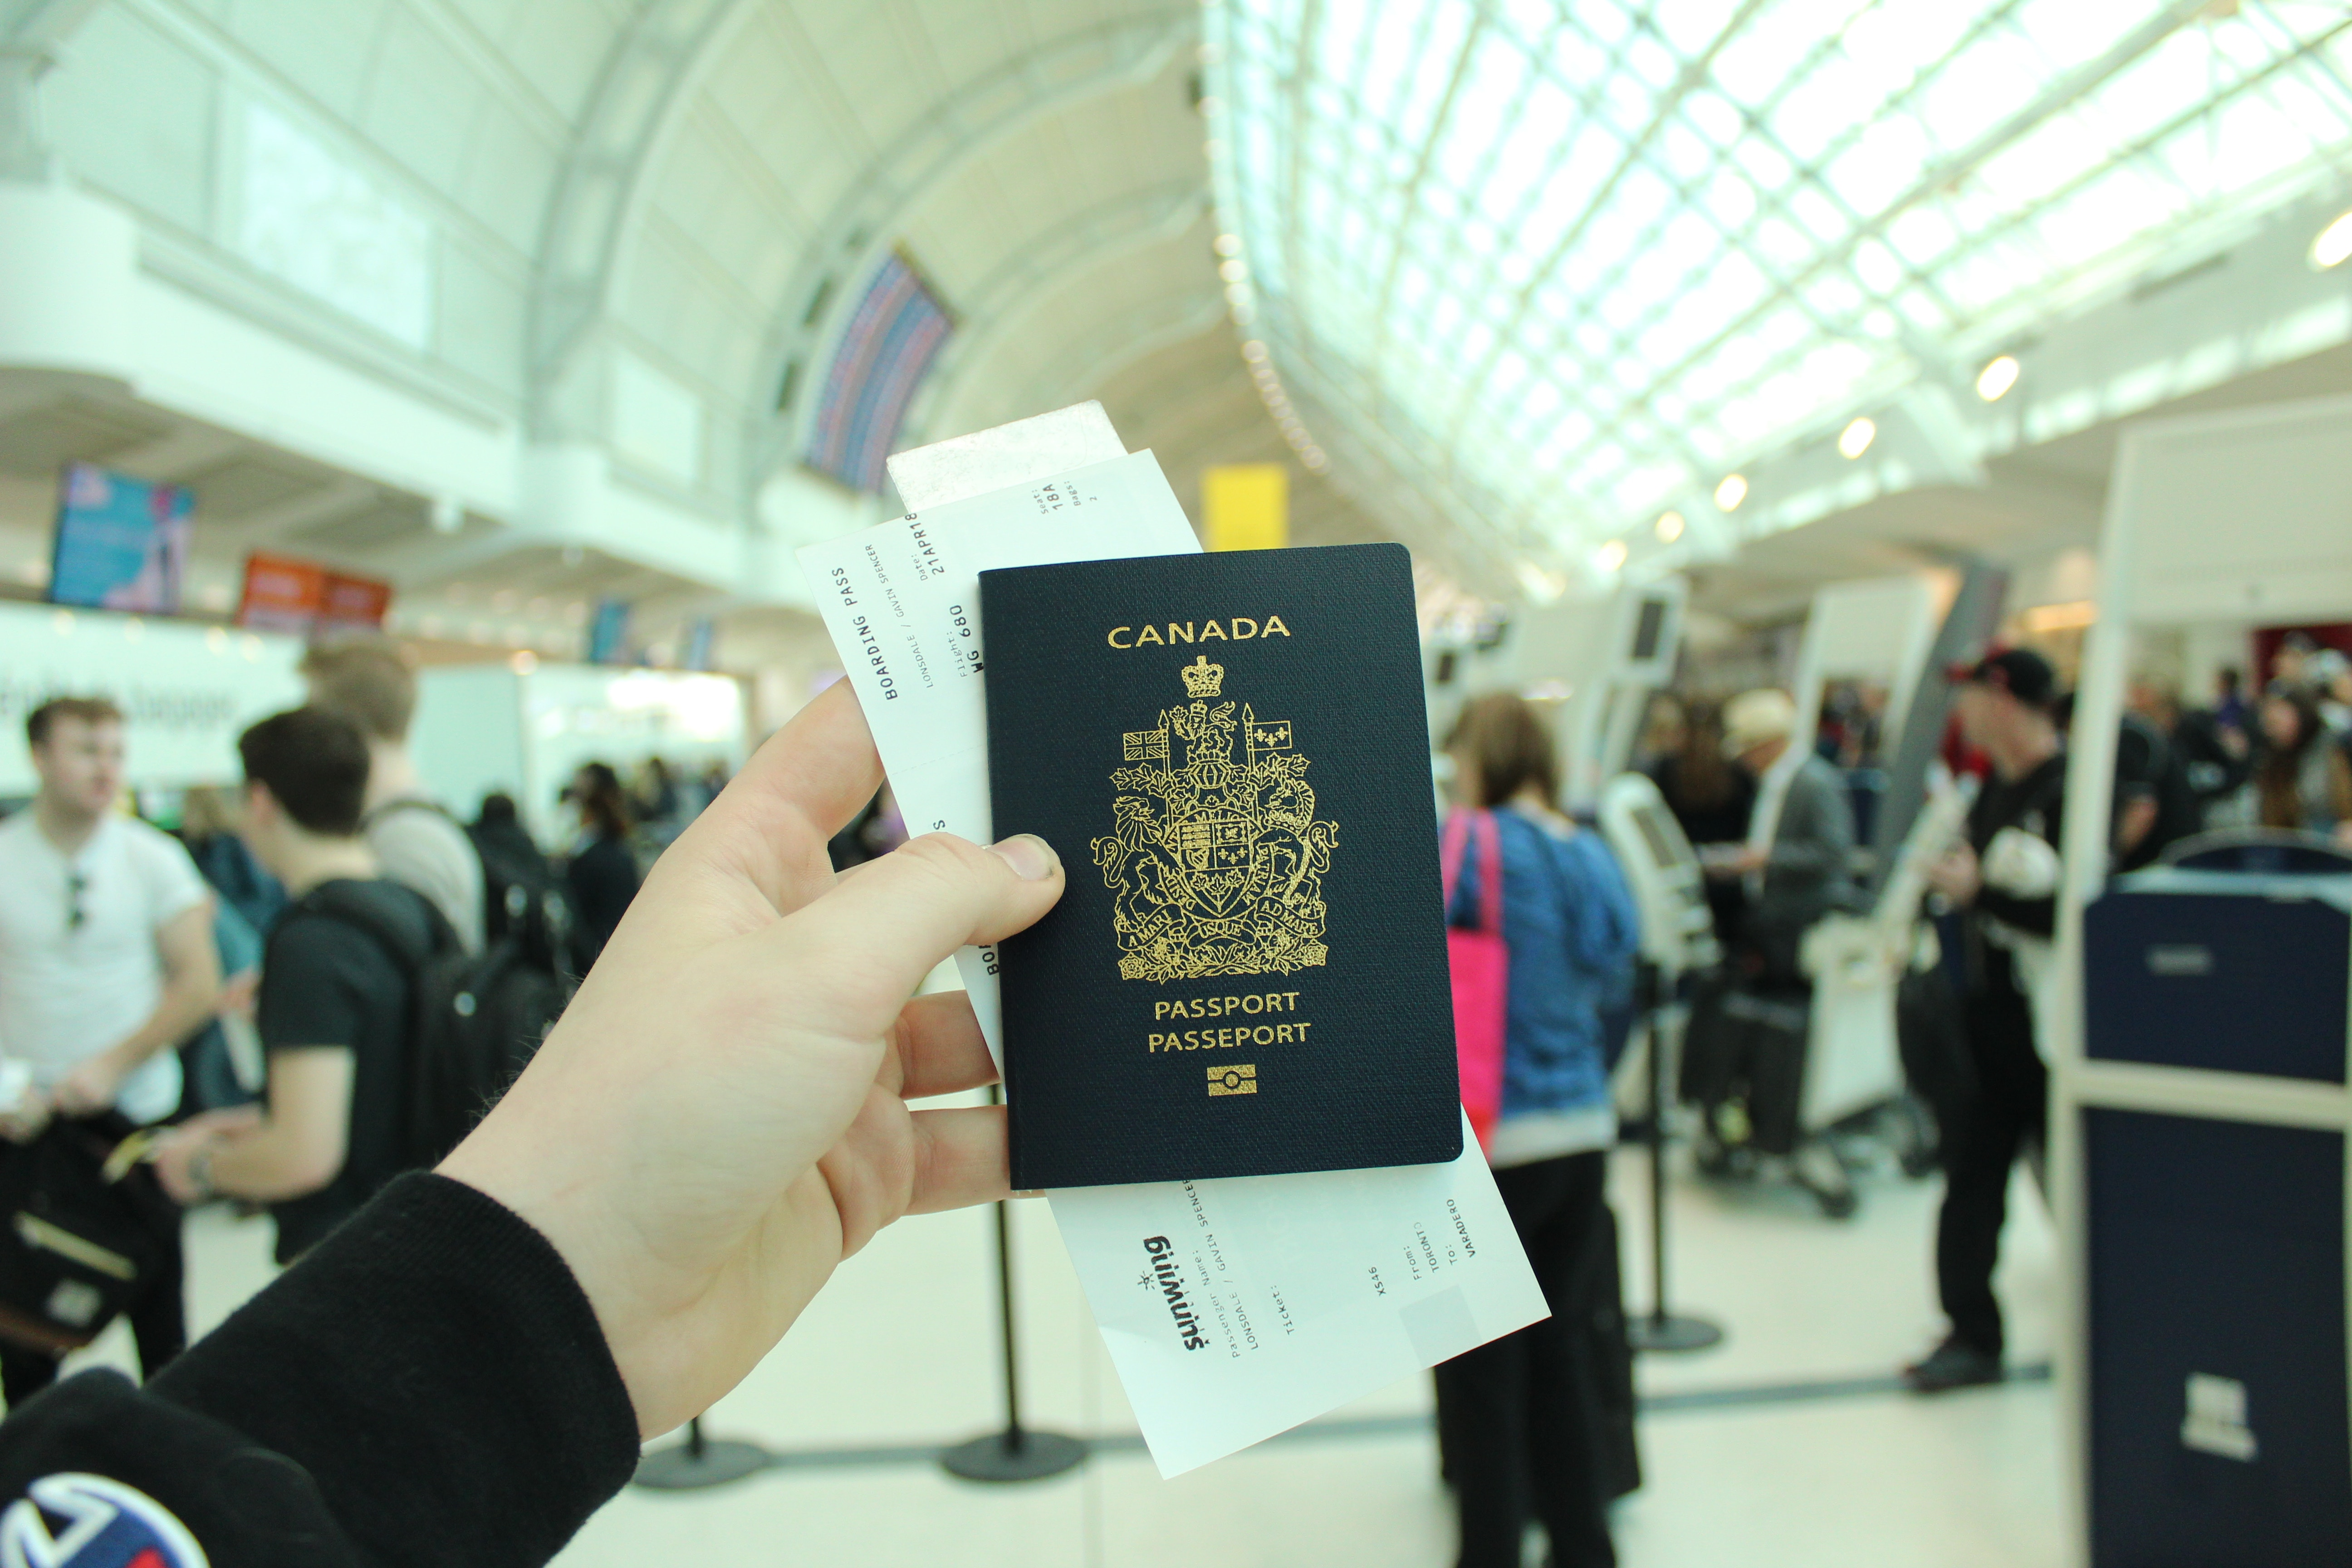 paszport w ręcę